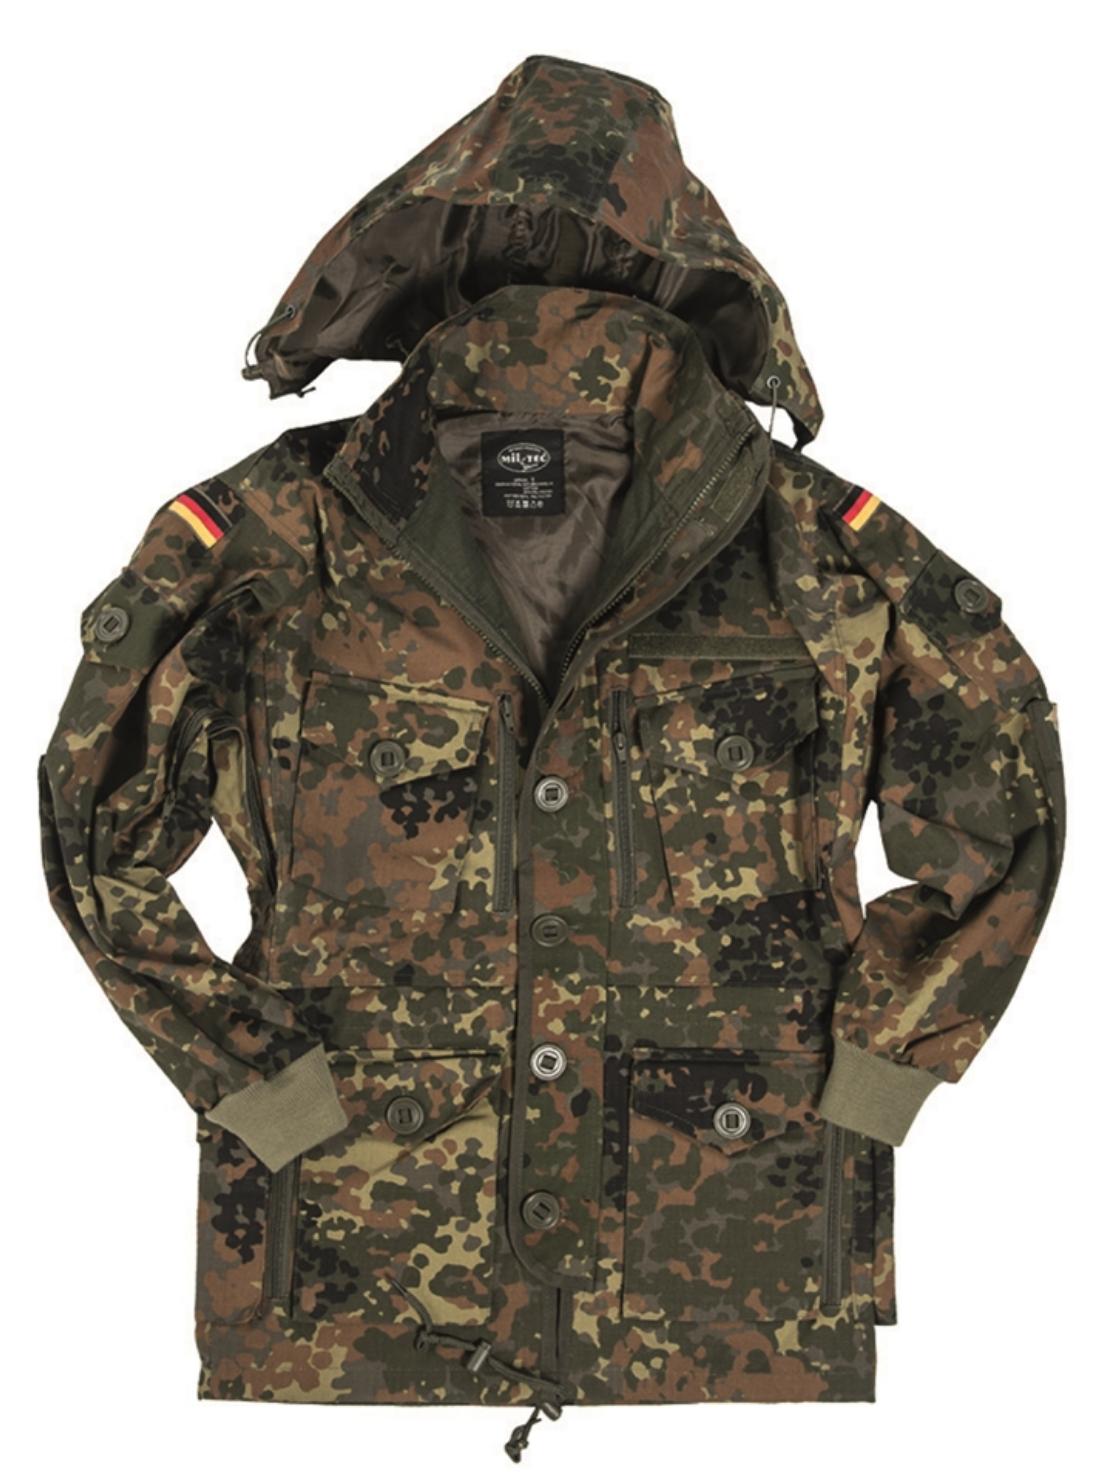 Commando Smock jacket